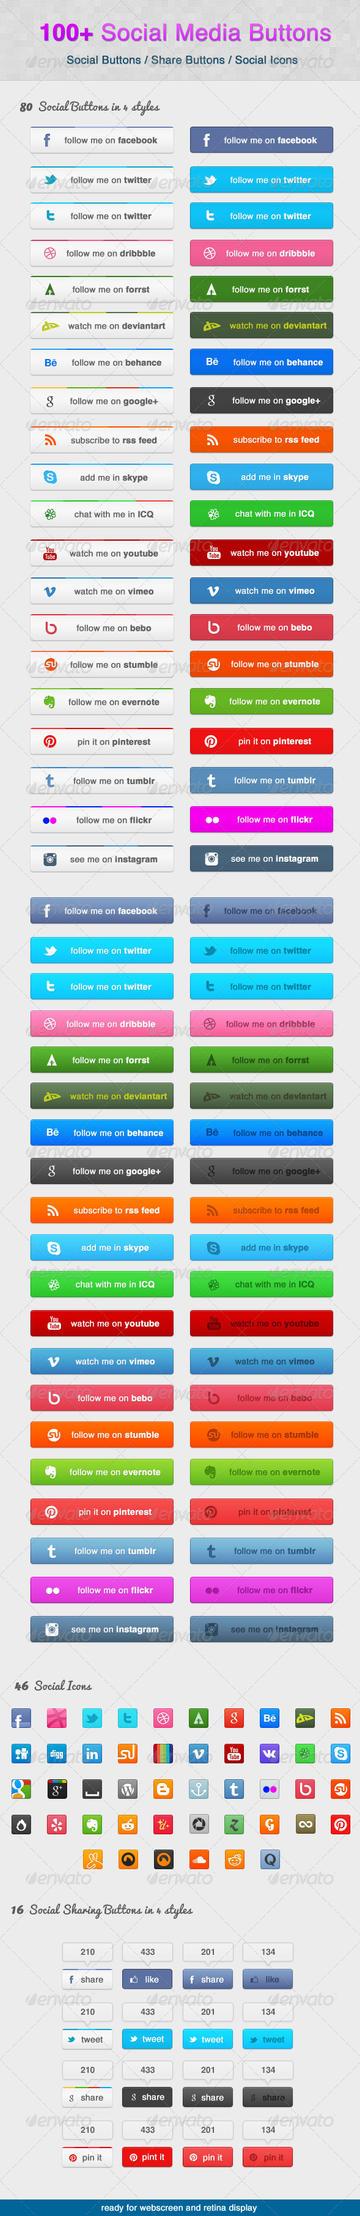 100 Social Media Buttons by KL-Webmedia